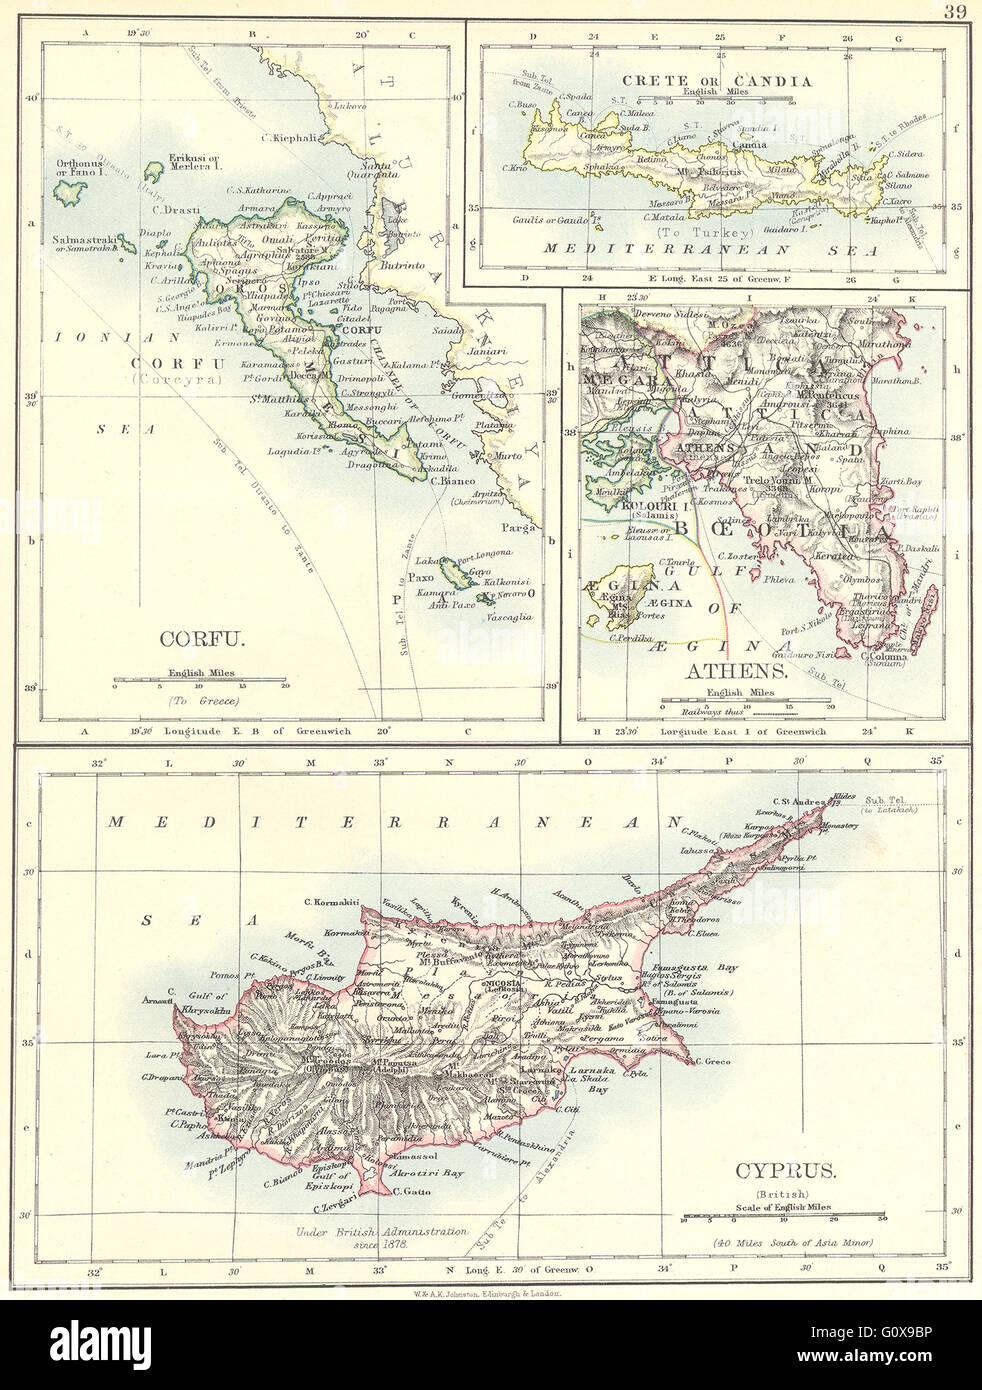 Carte Chypre Crete.Grece Corfou Crete Ou Candia Athenes Chypre 1897